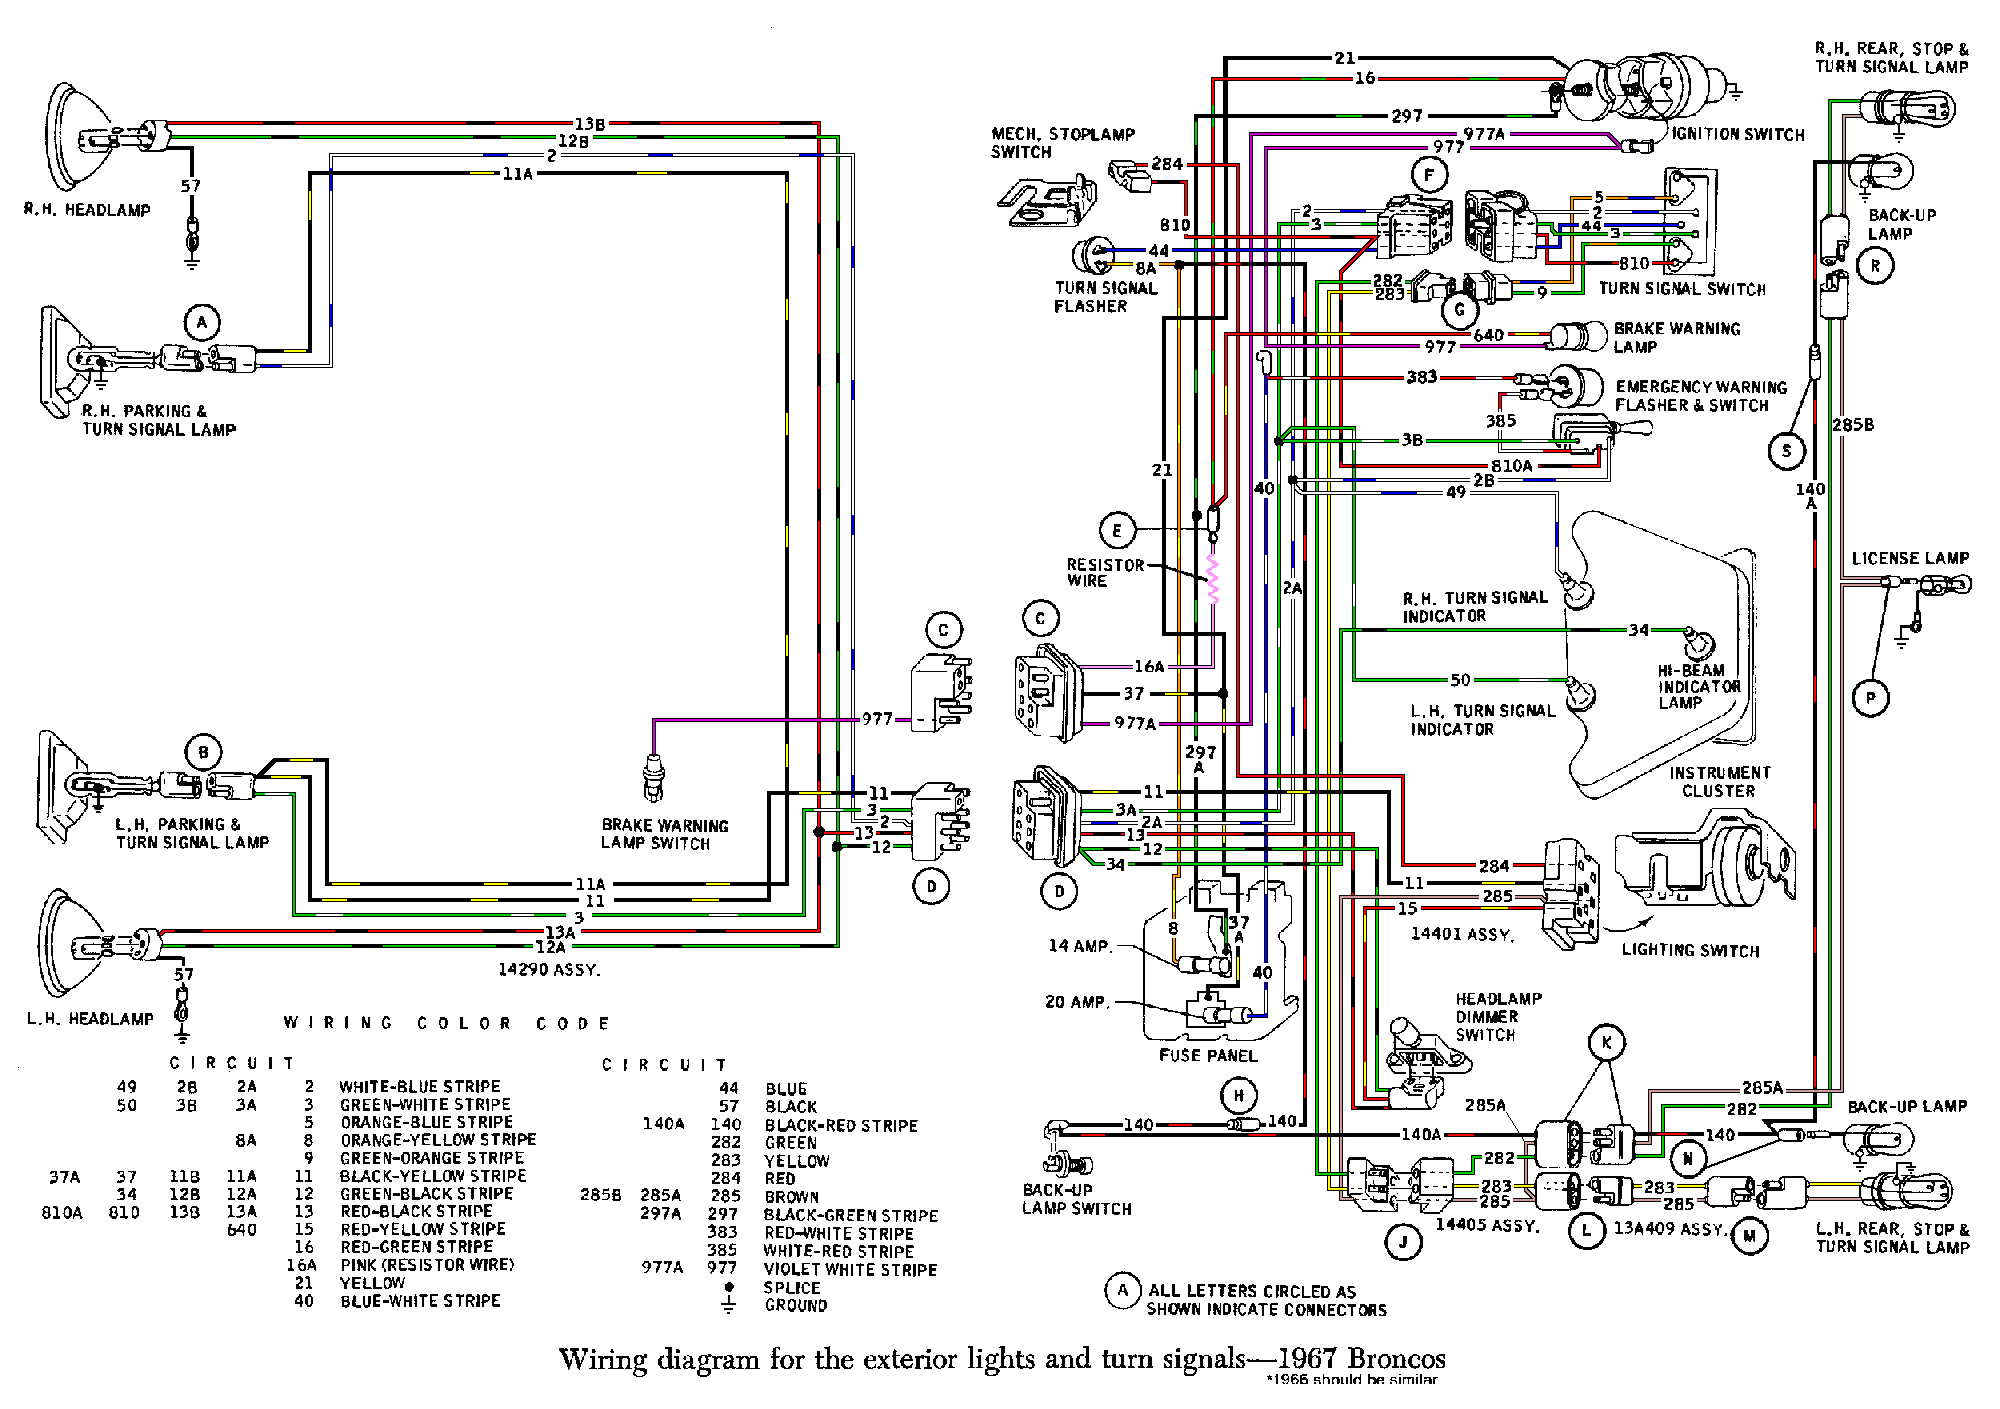 1975 f250 wiring diagram wiring diagram show 1975 ford bronco wiring diagram 1975 f250 wiring diagram